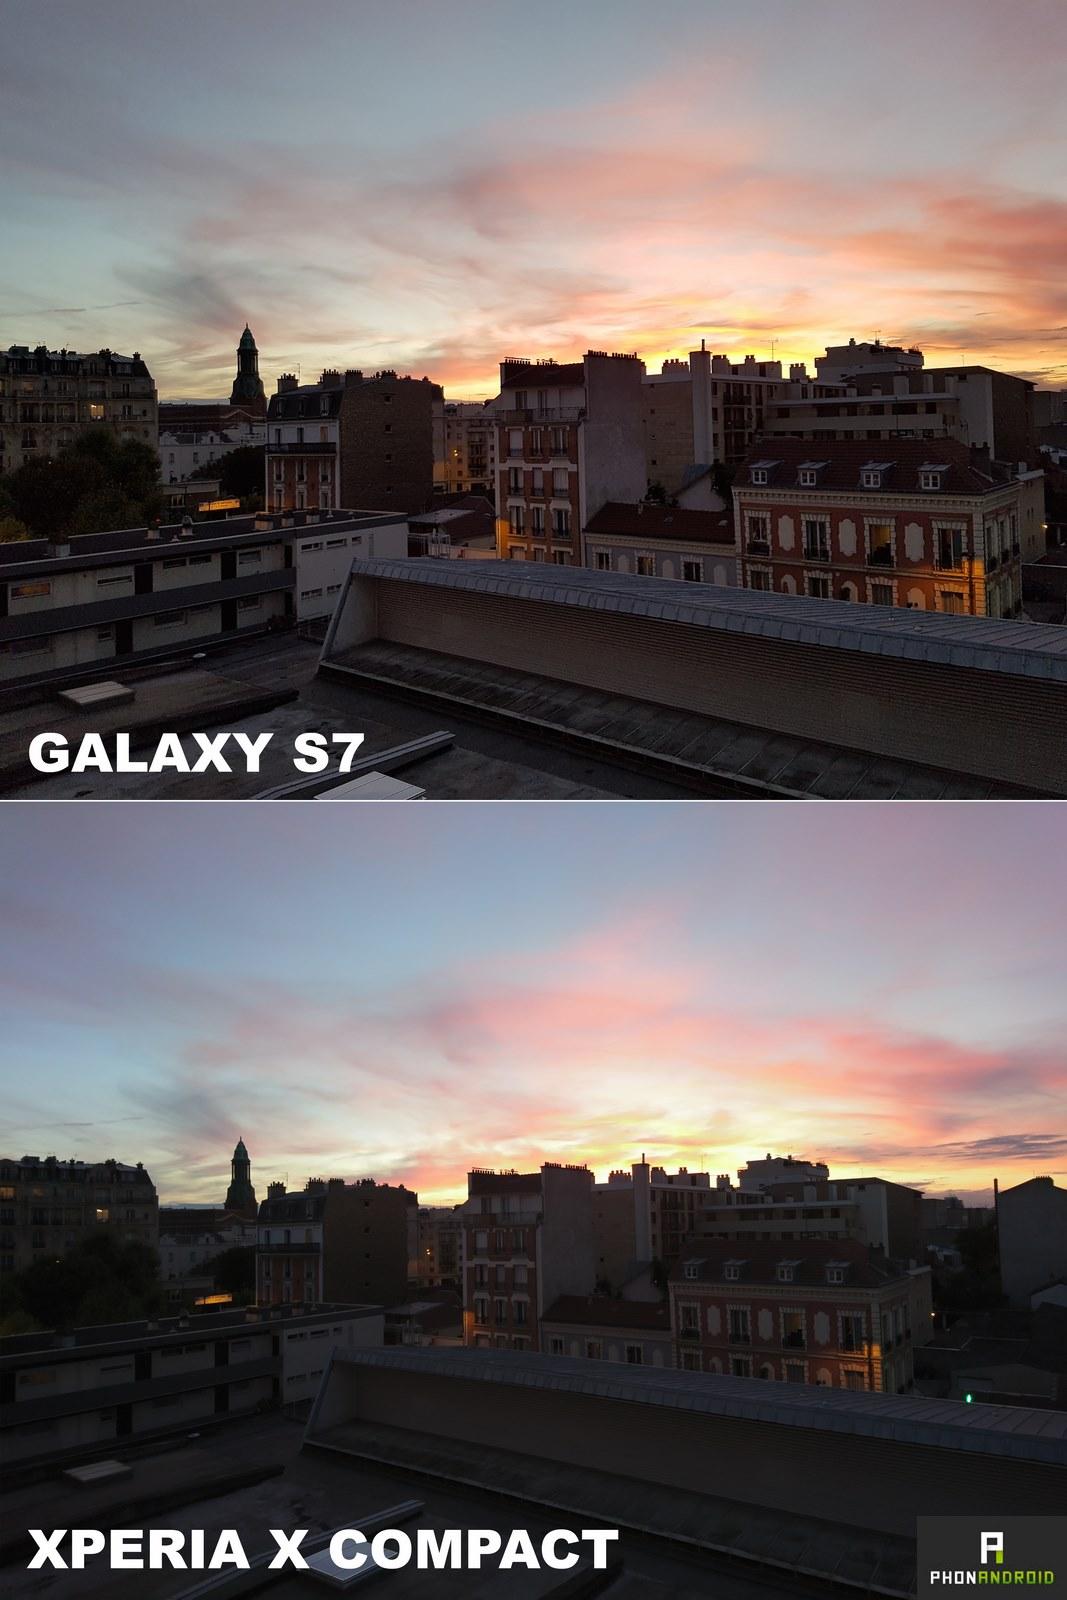 xperia x compact galaxy s7